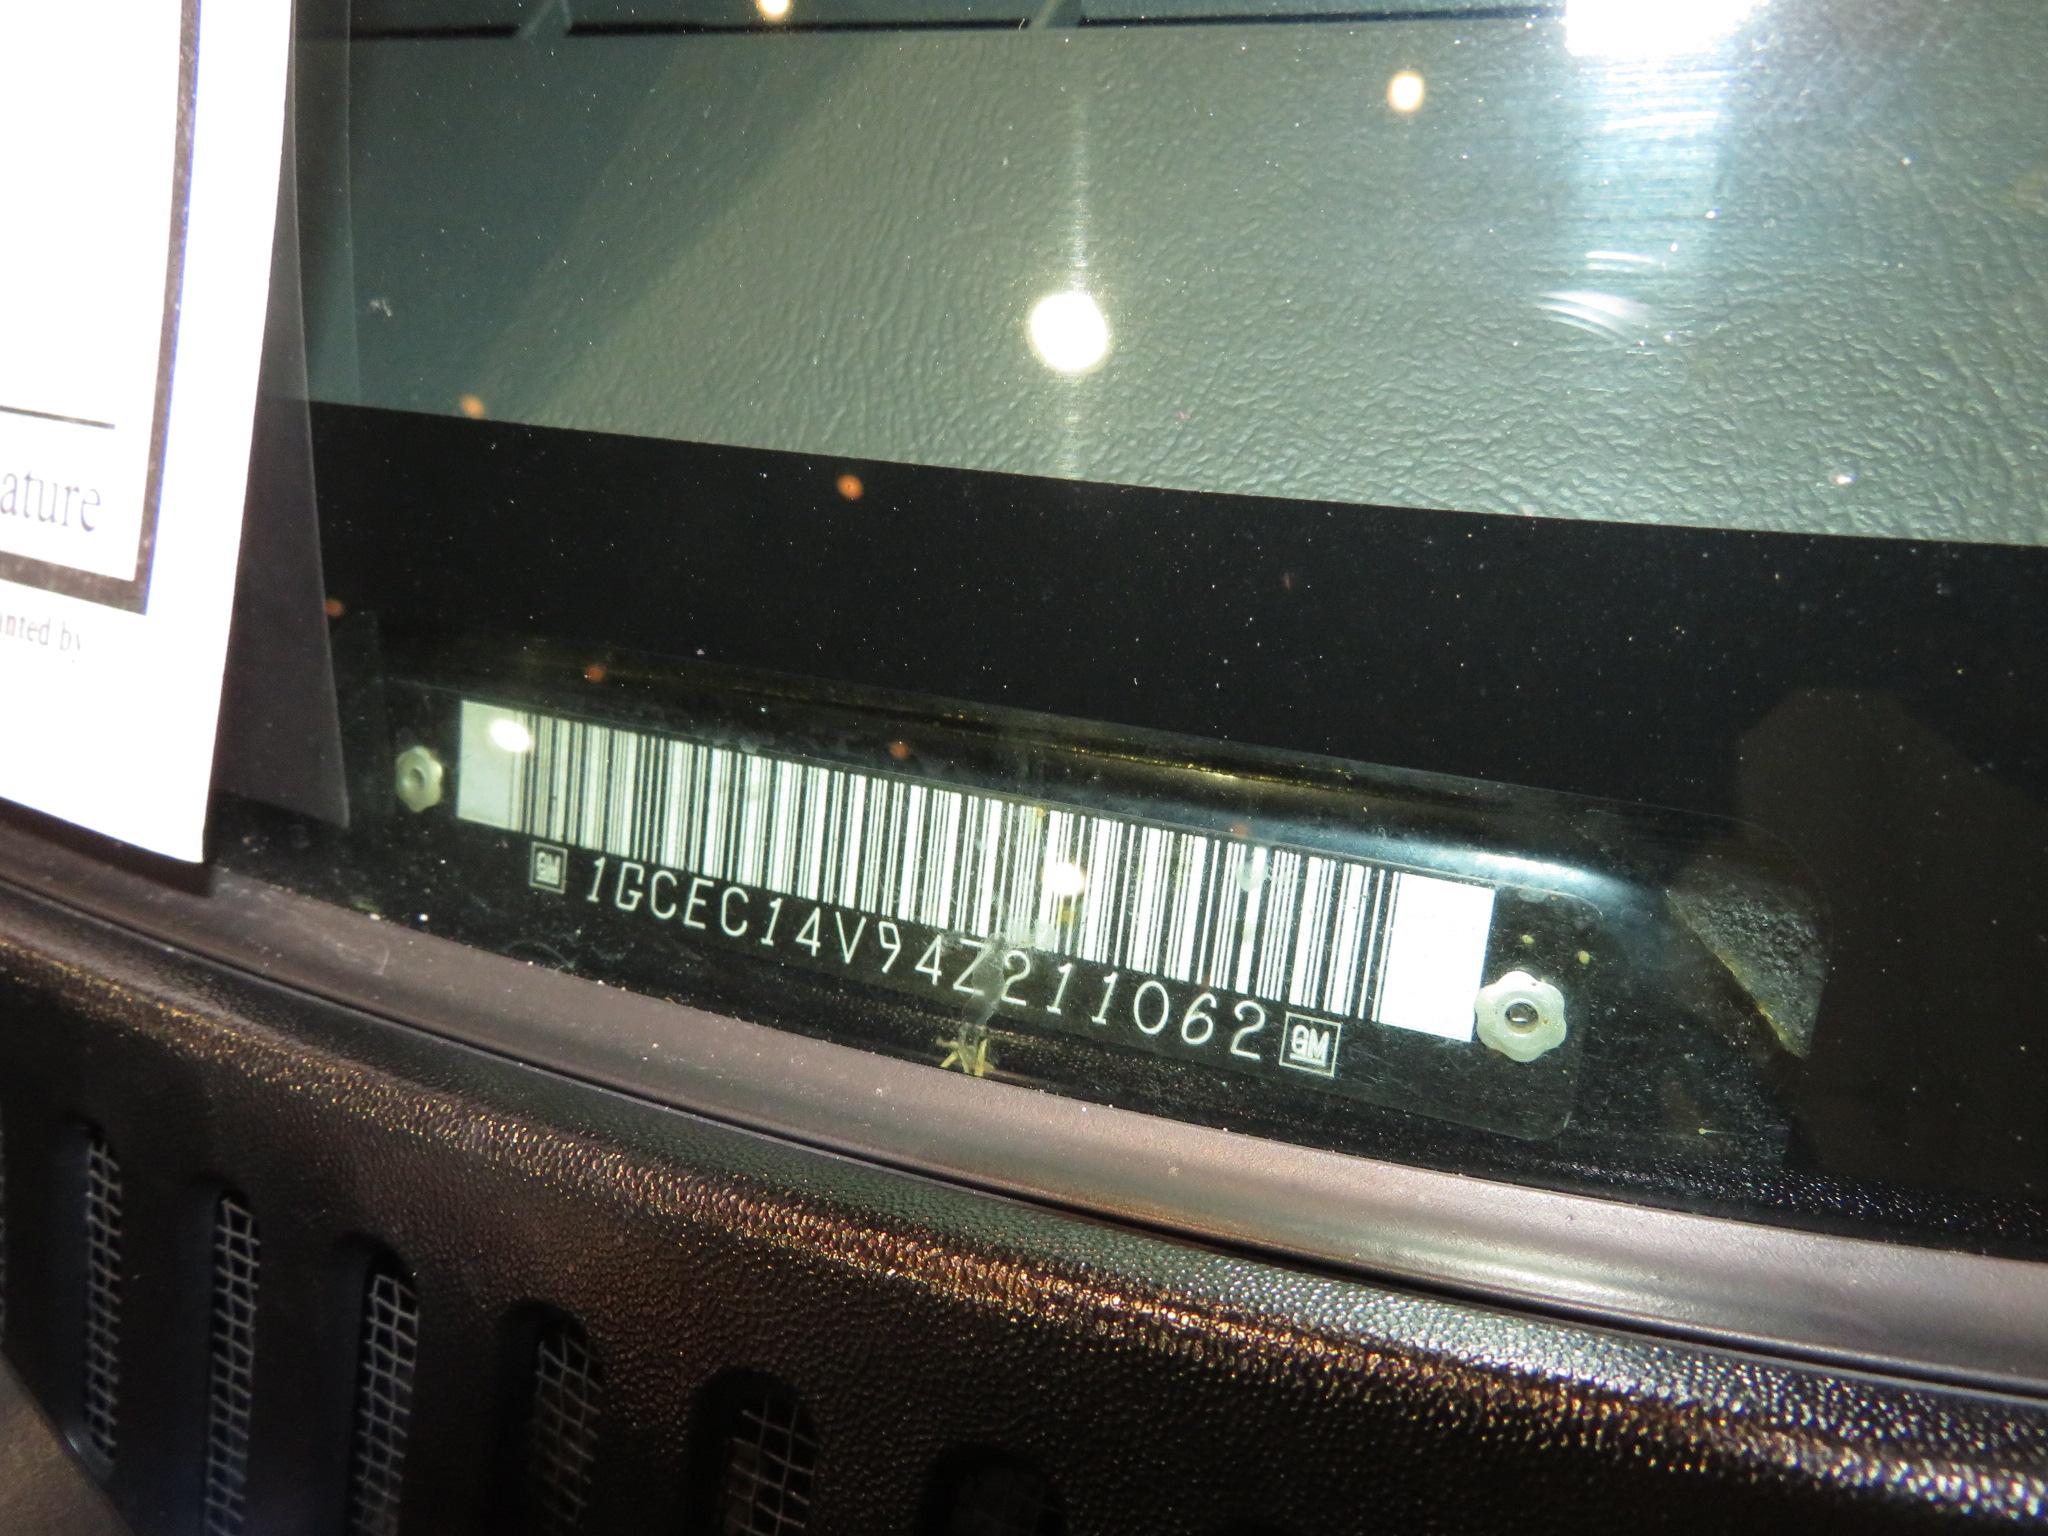 4th Image of a 2004 CHEVROLET SILVERADO 1500 RST